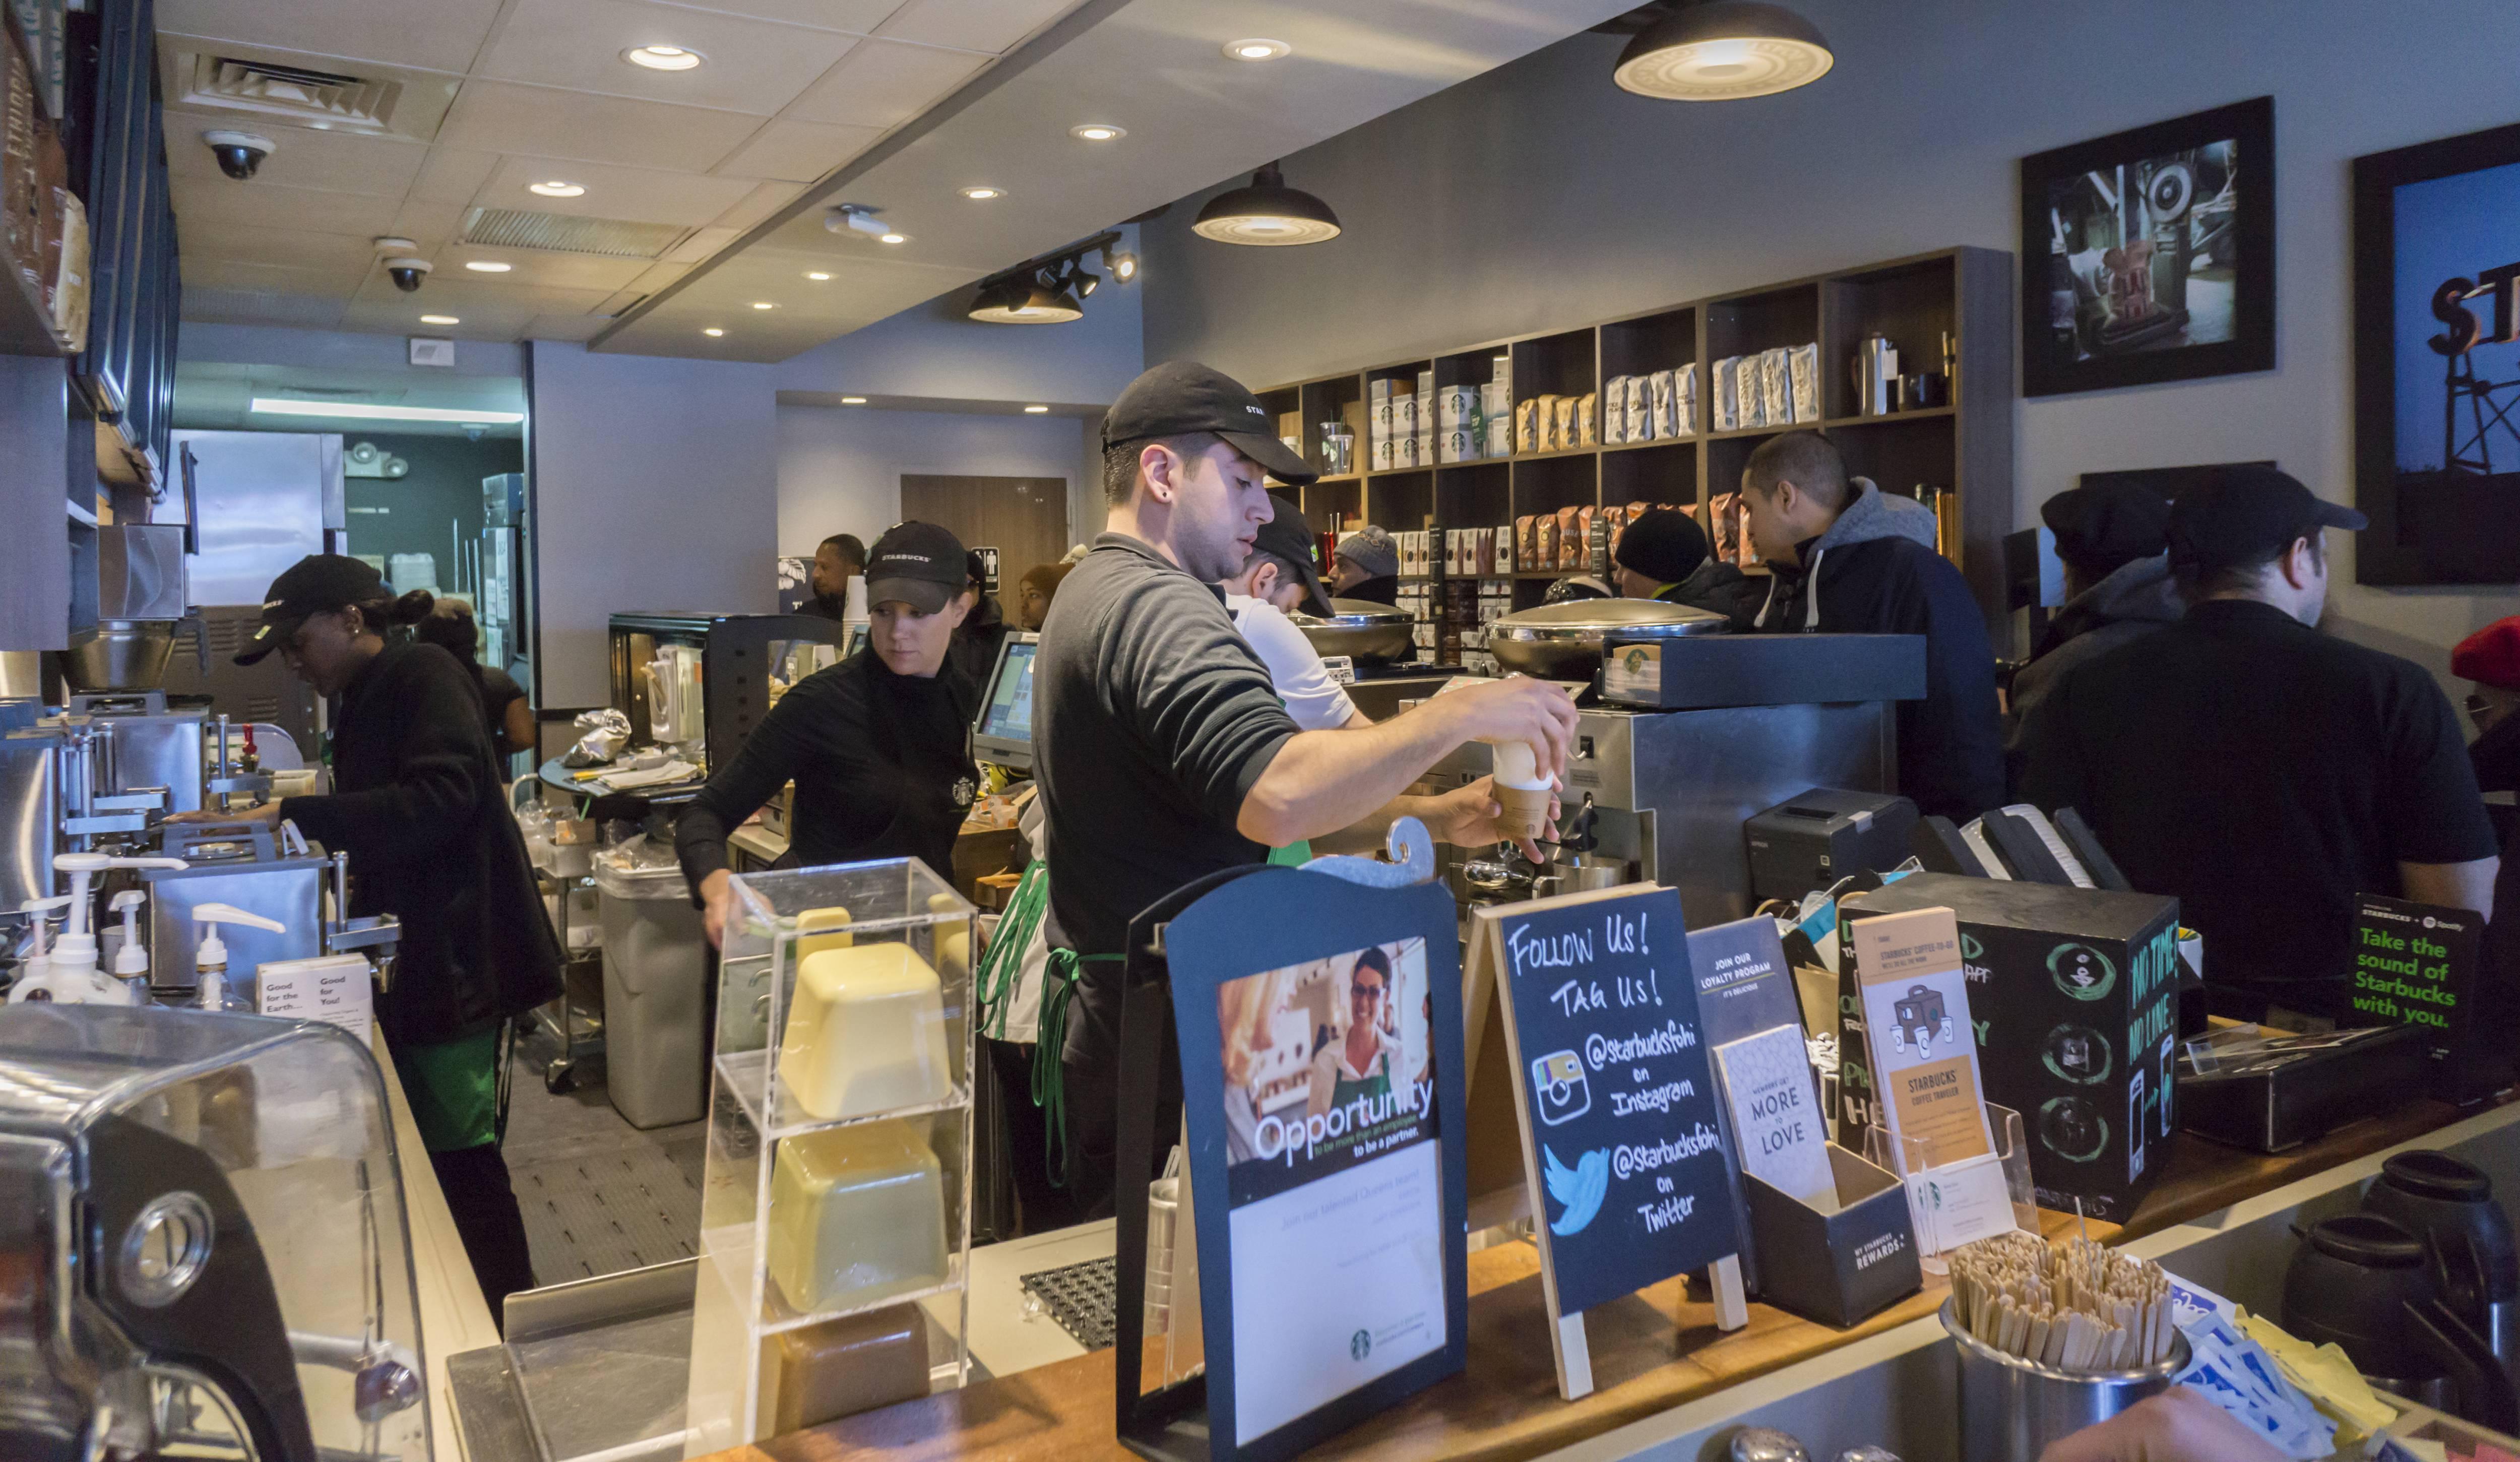 Starbucks in New York